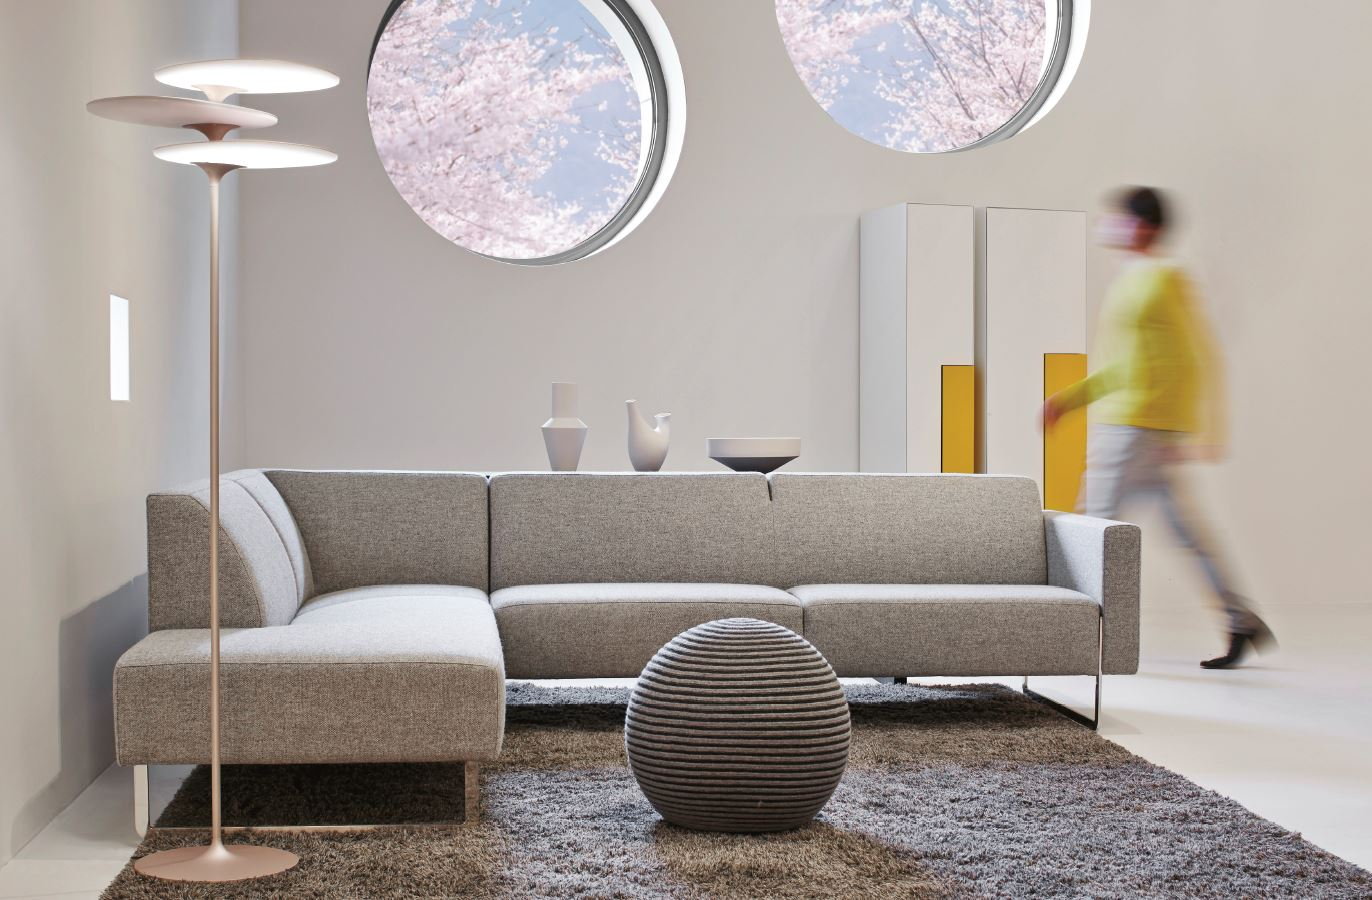 Woonkamer Staande Lamp : Moderne staande lampen woonkamer: verlichtingtip: de woonkamer straluma.